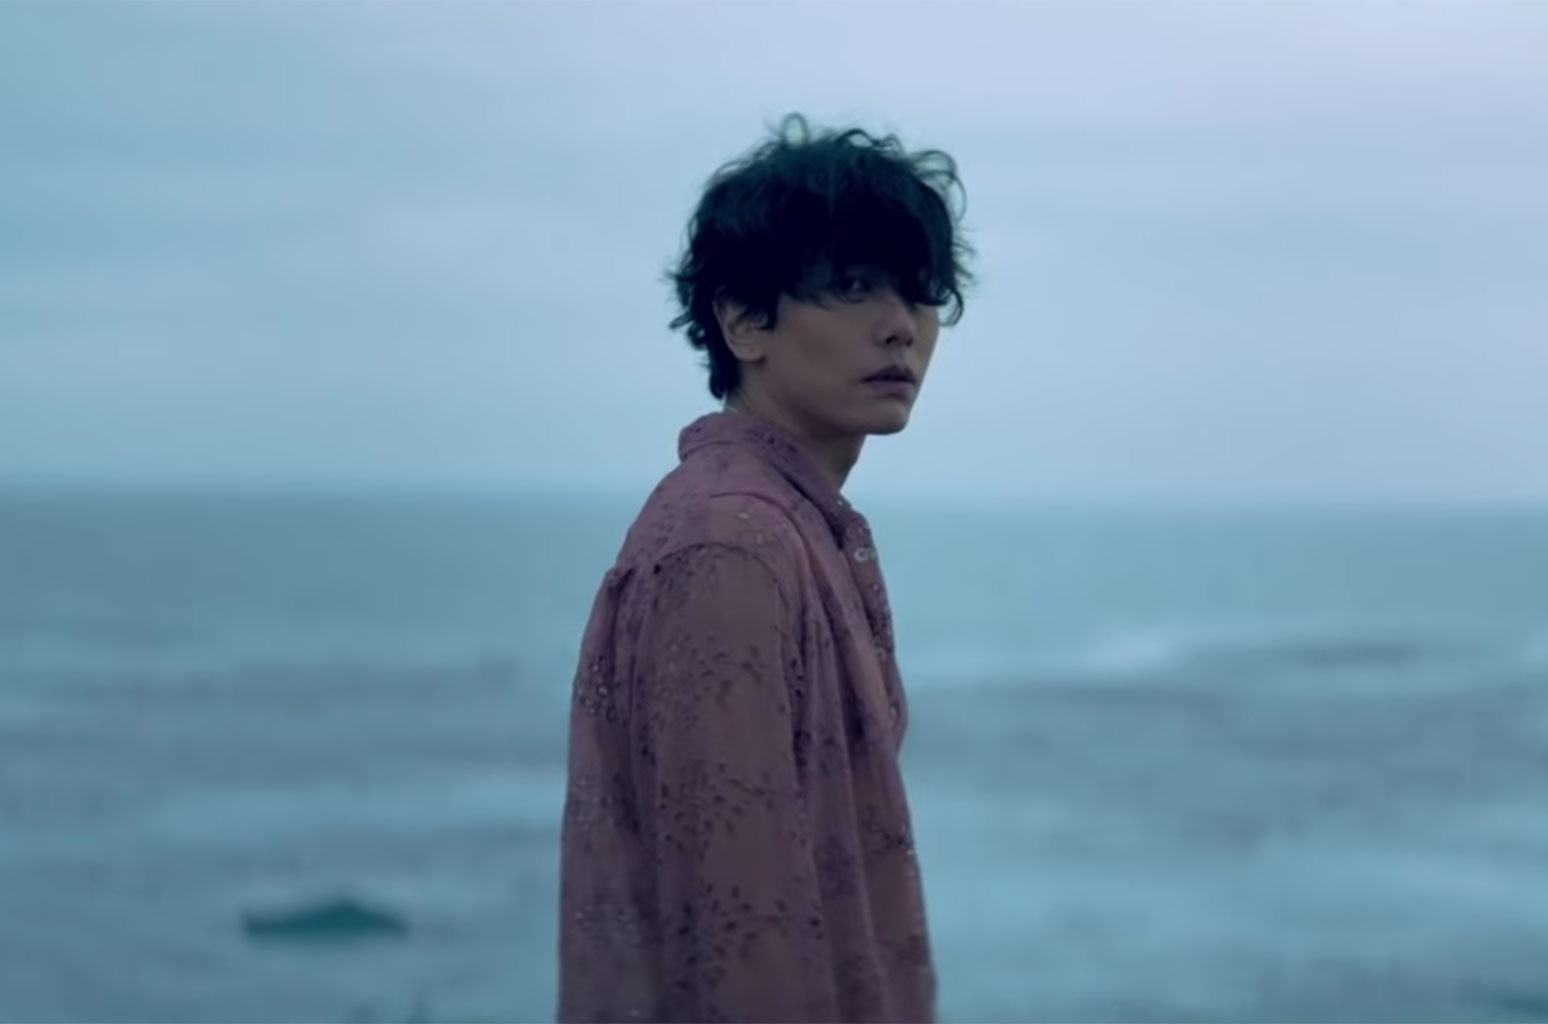 Park Hyo Shin by the ocean